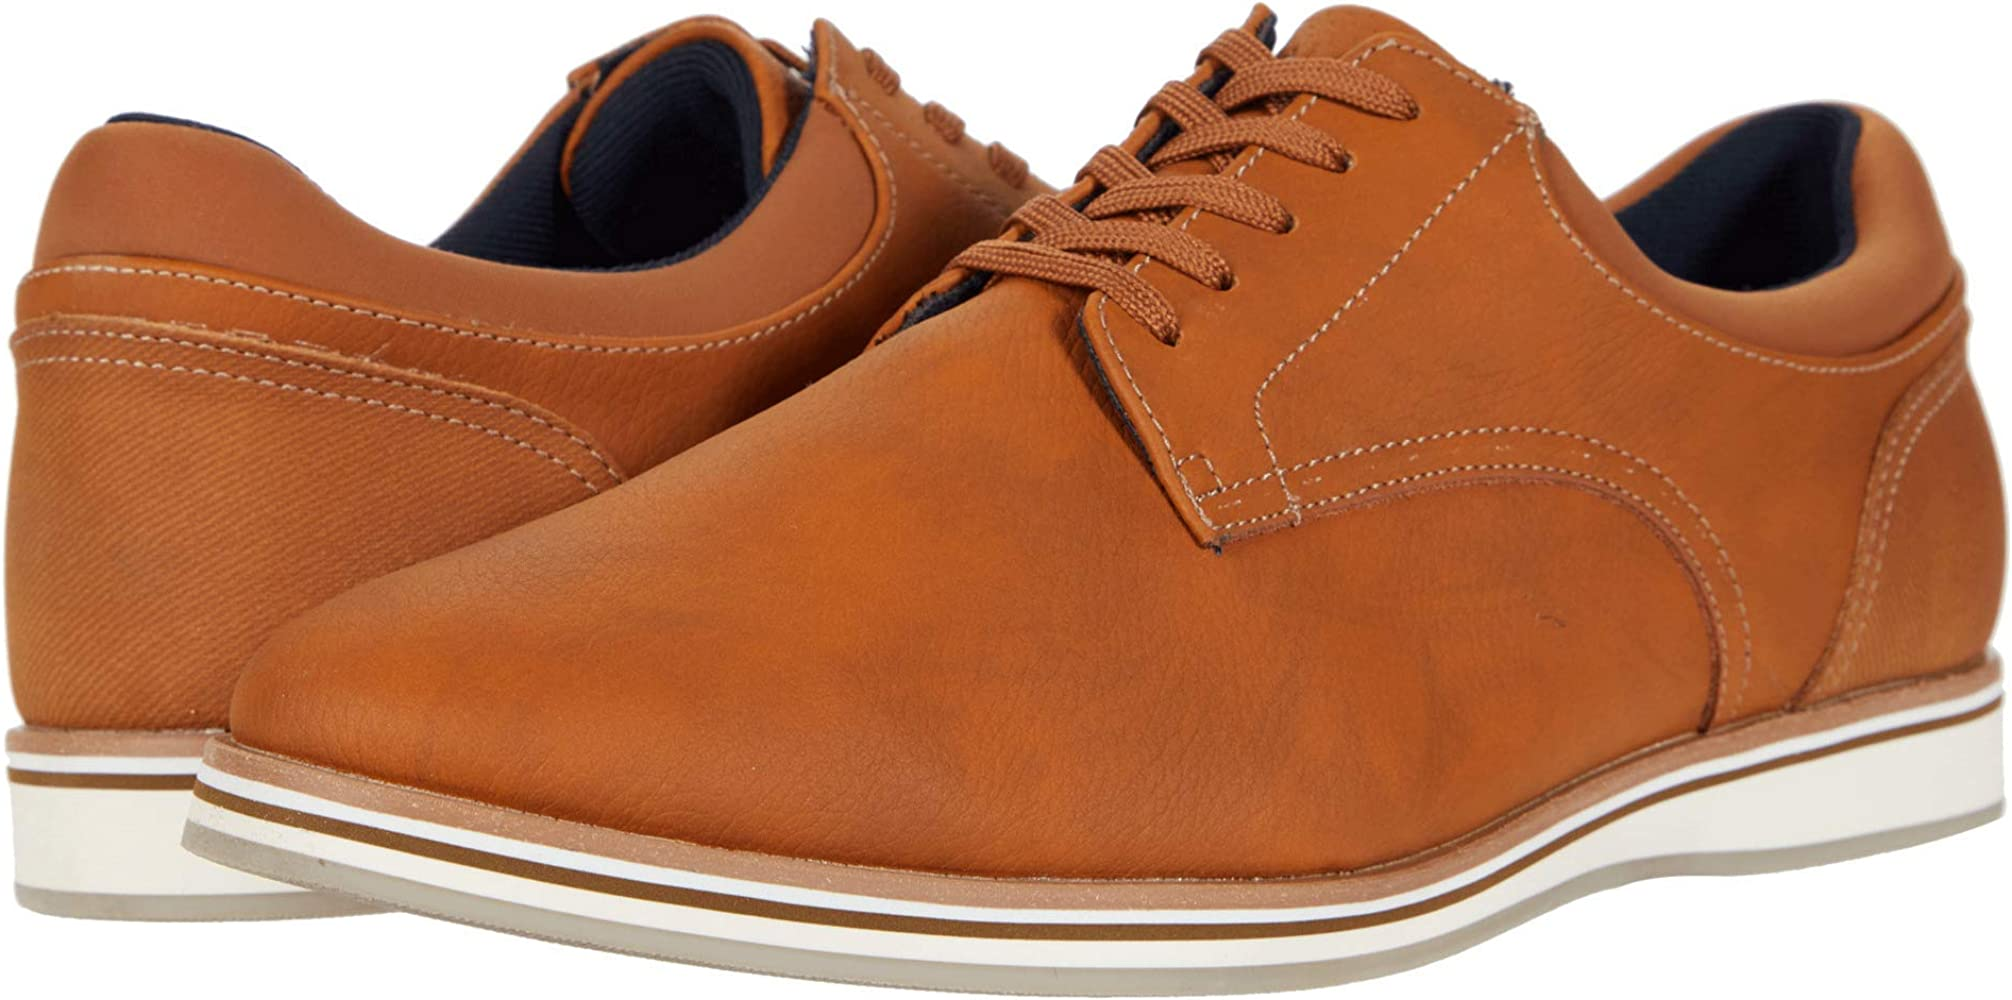 Amazon.com: ALDO Cycia: Shoes